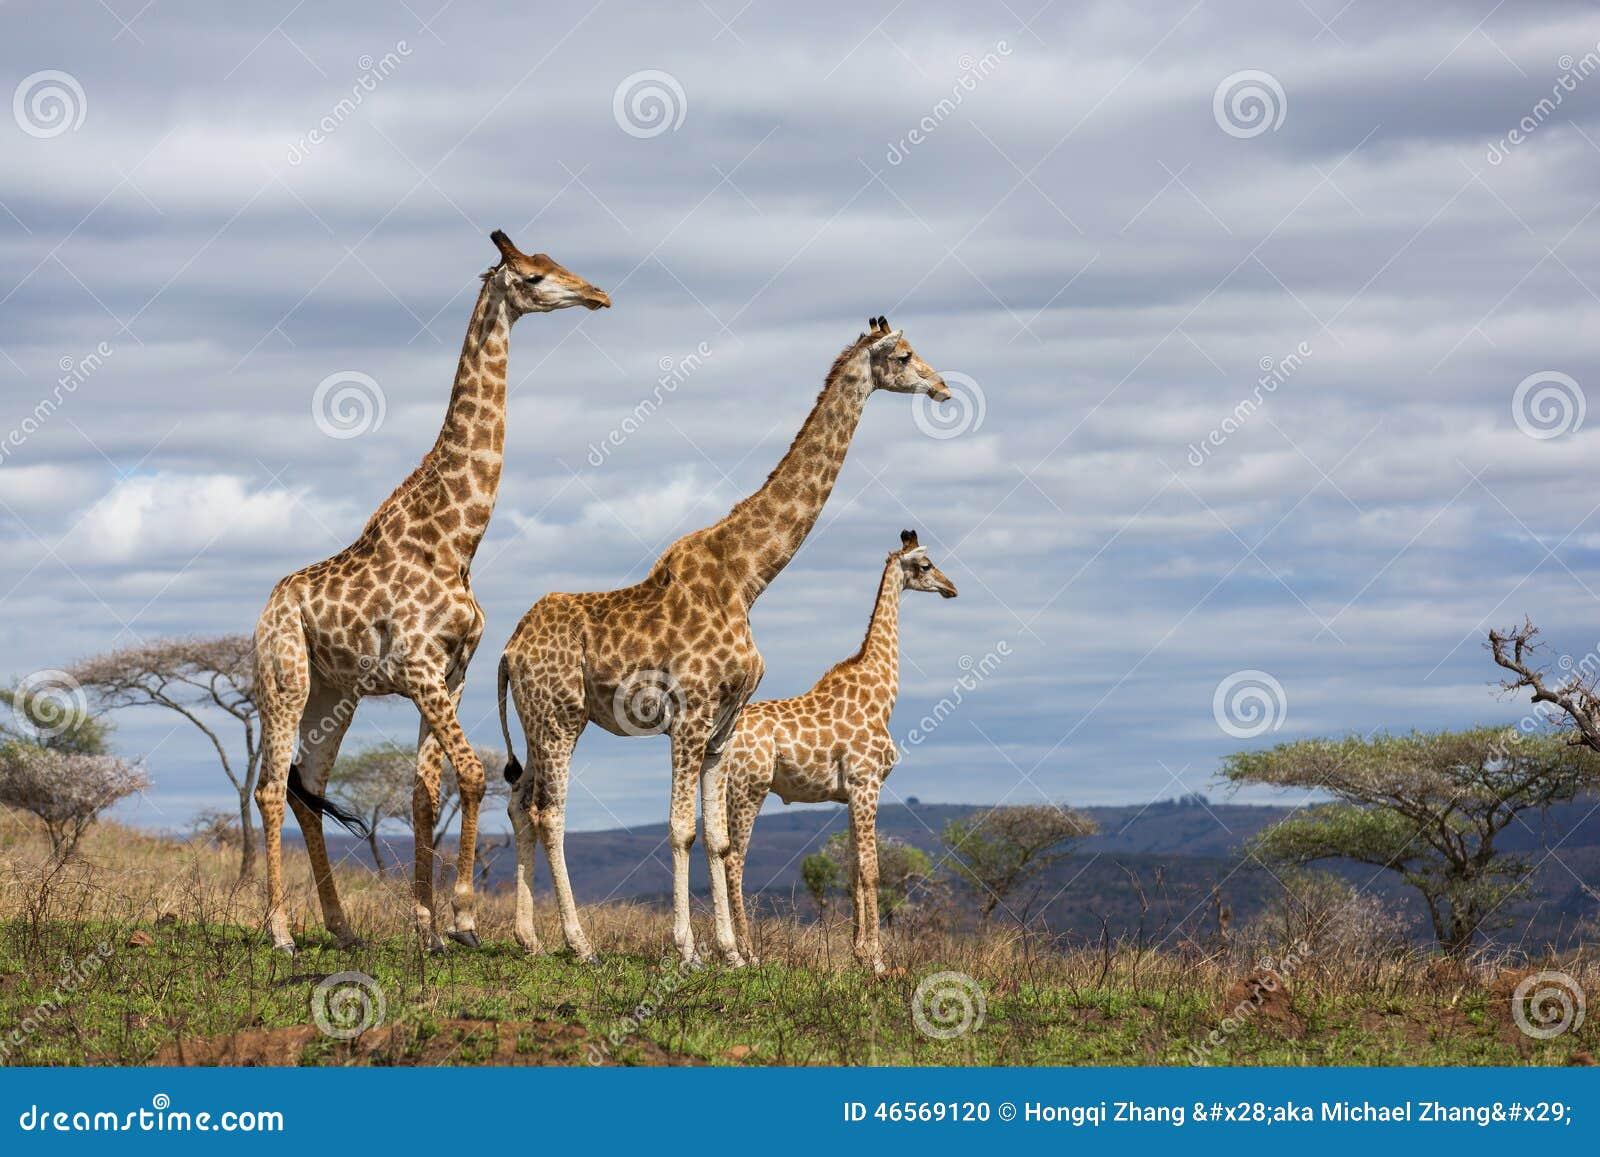 Giraffes game reserve